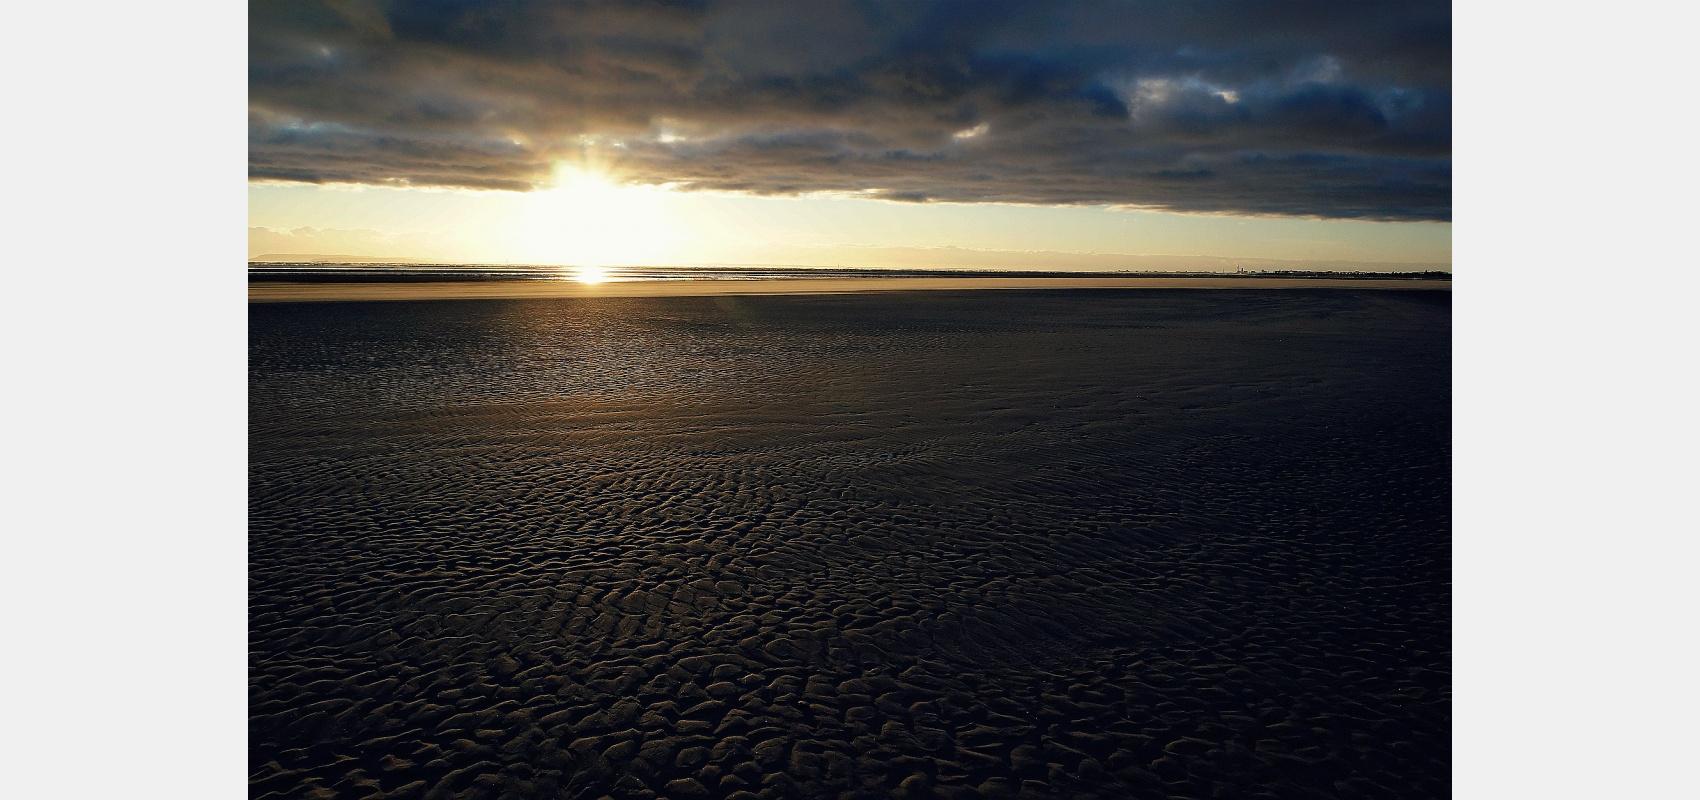 Seascape, low, tide, Coastal, image, Patterns, sand, sunset